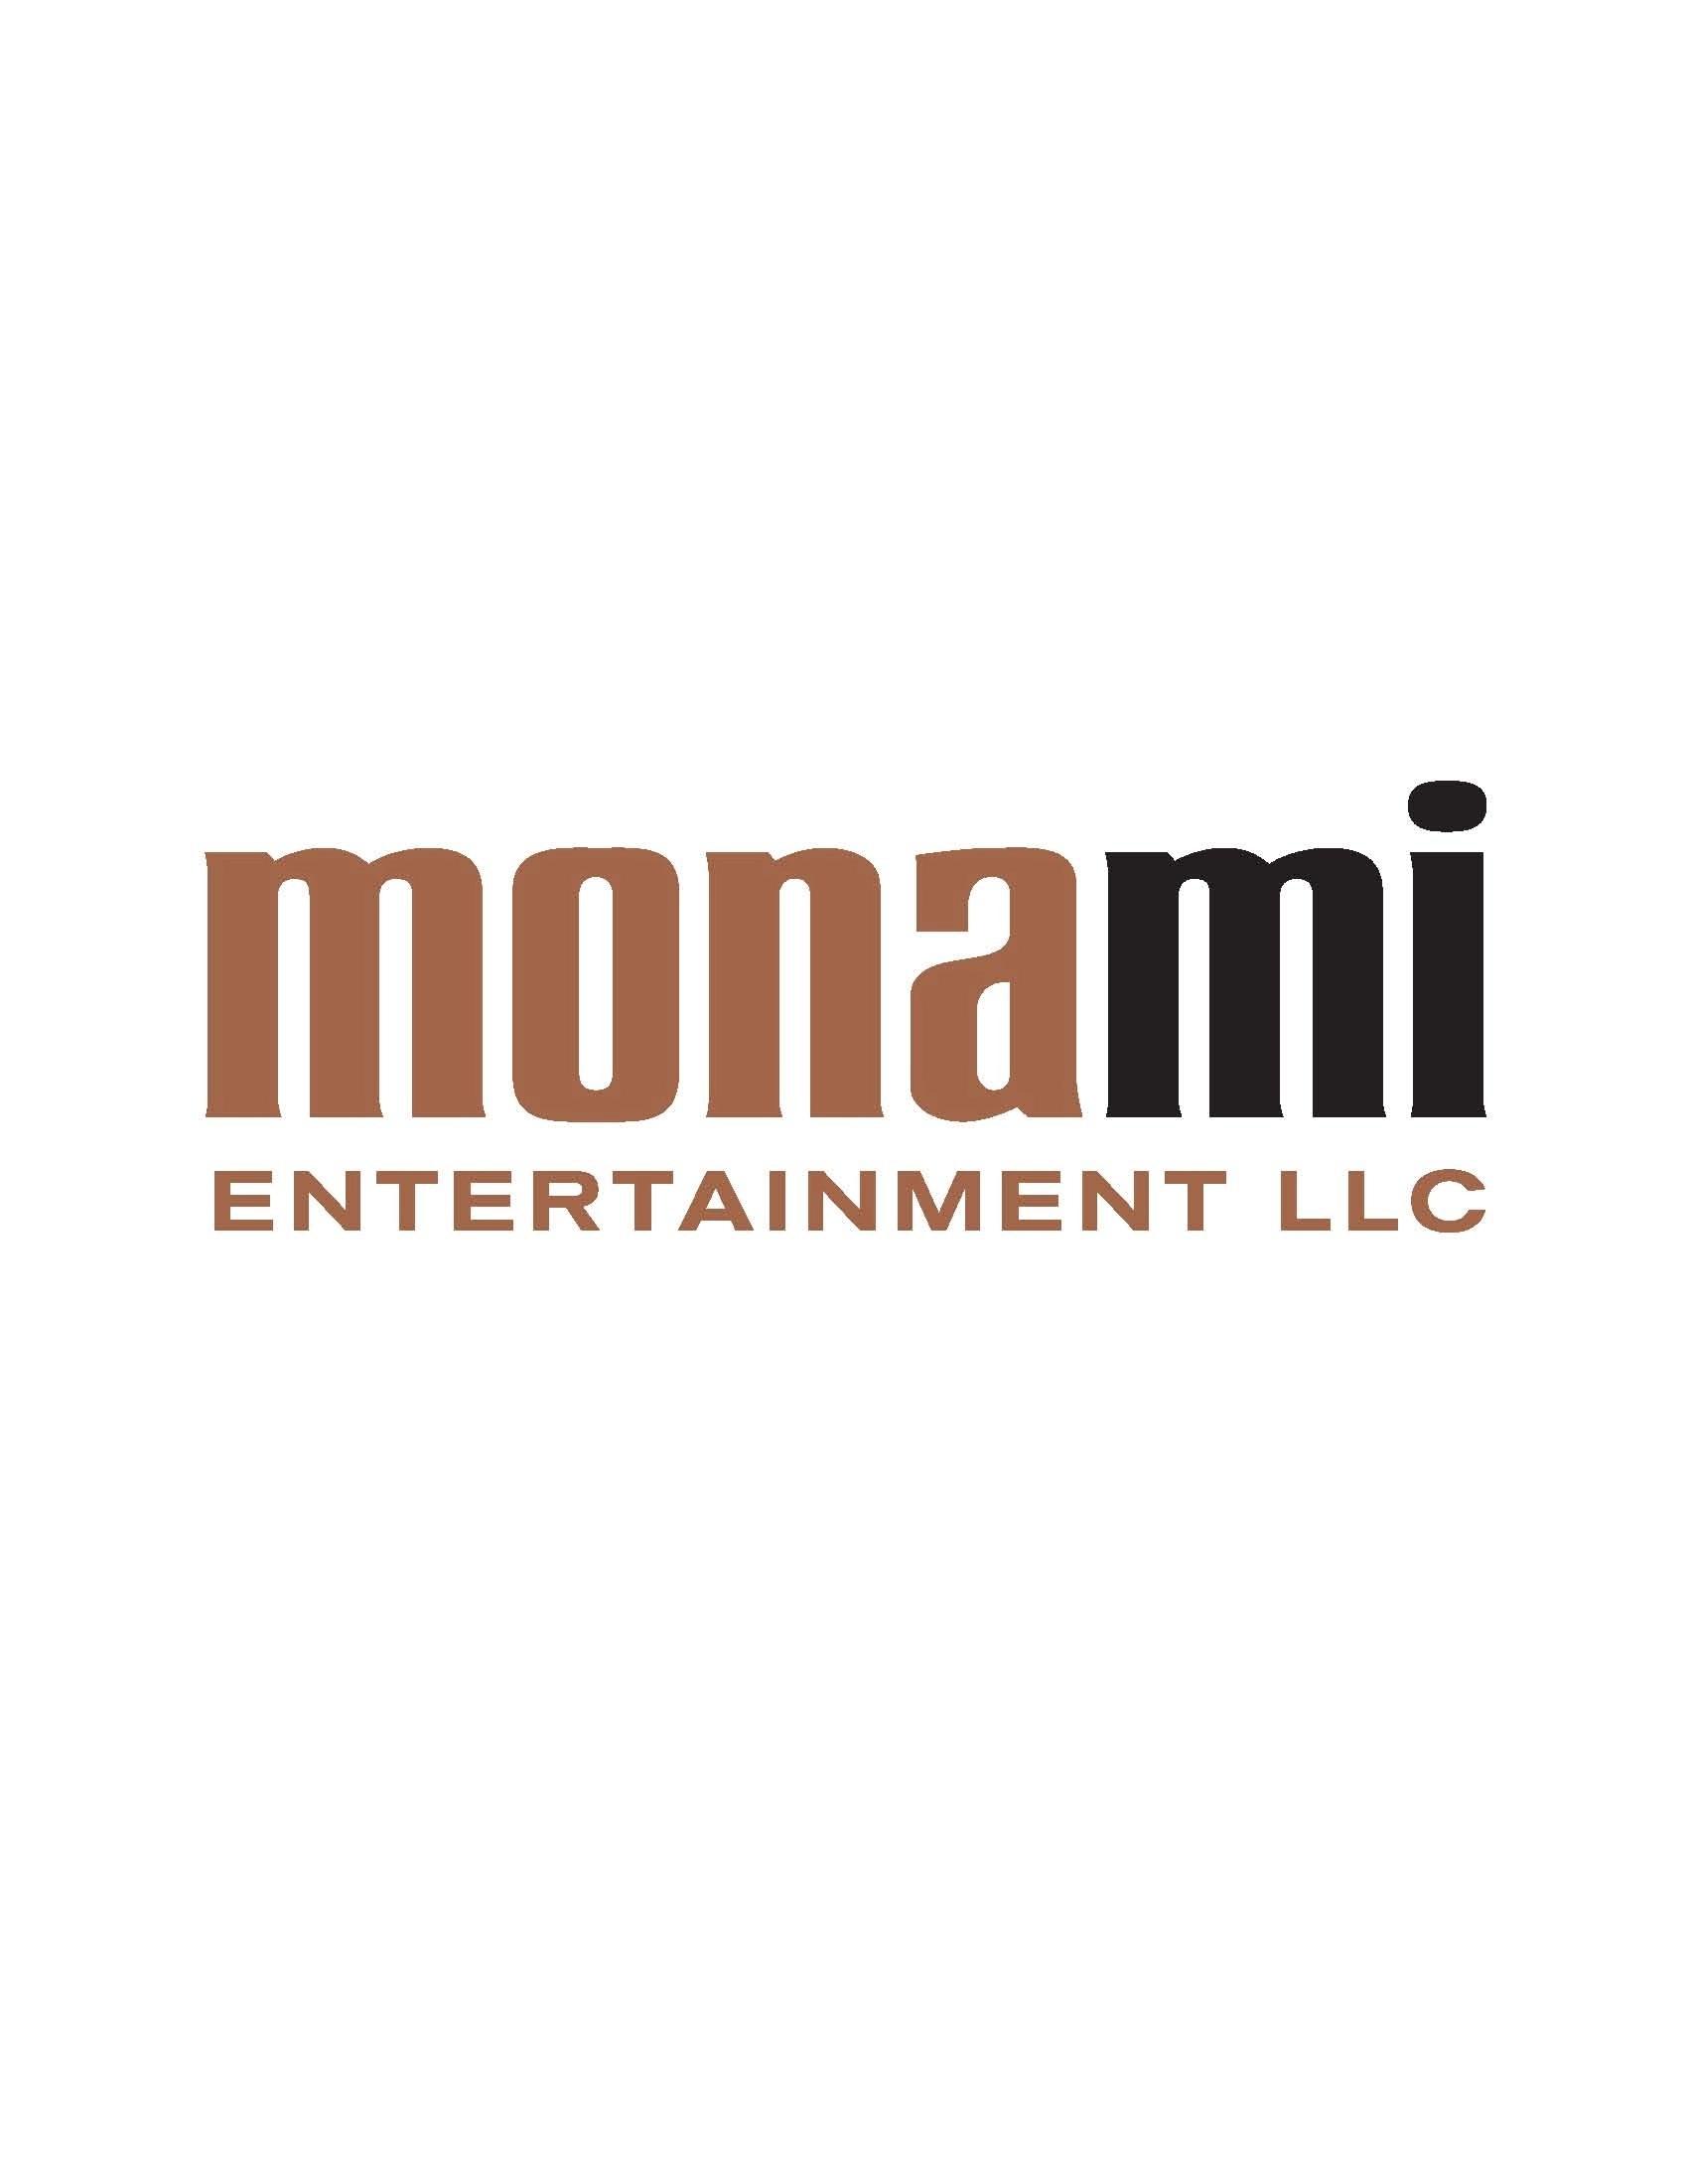 MONAMI ENTERPRISES